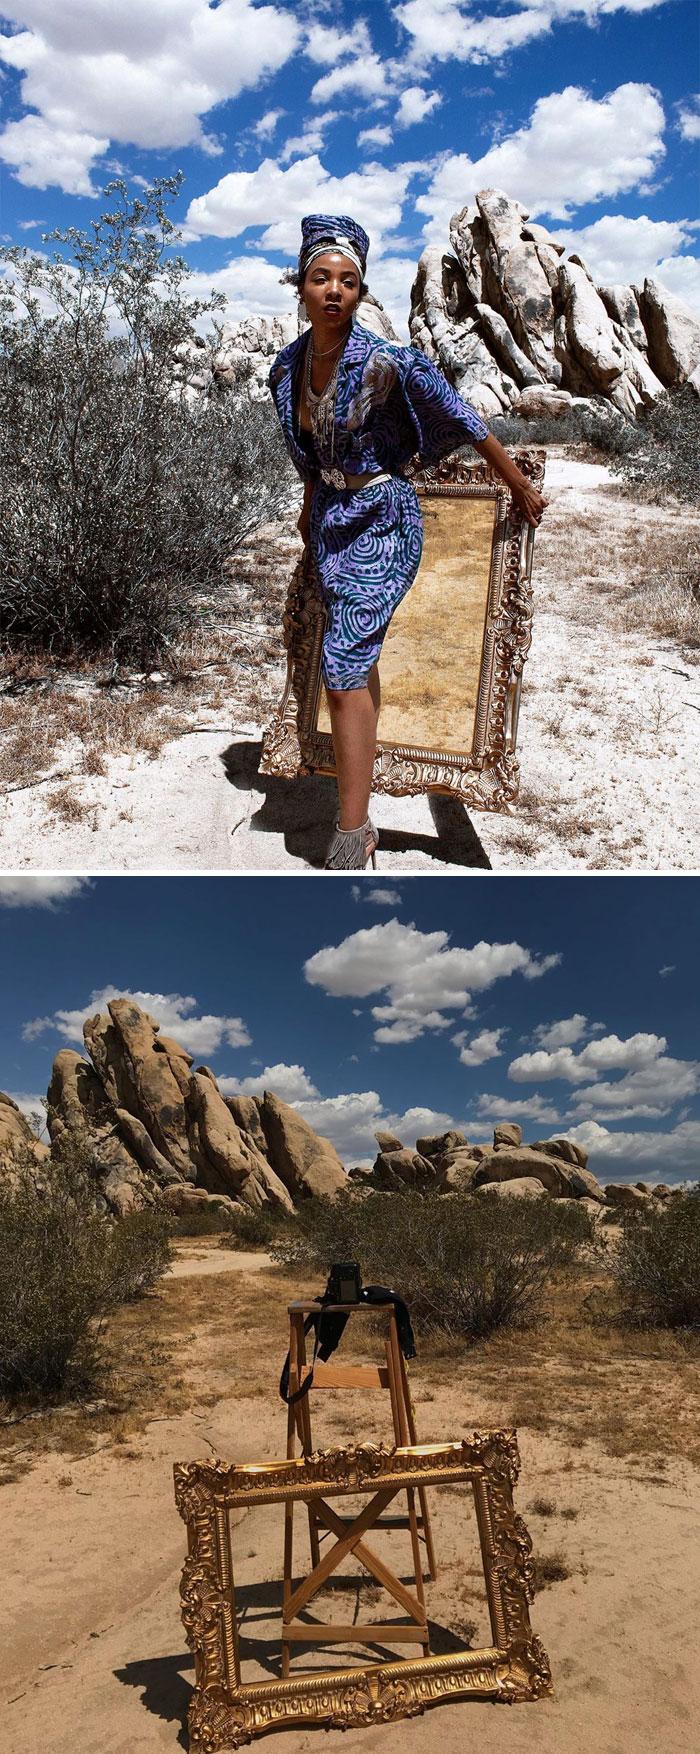 5d7f3c25bfd83 photo shoot behind the scenes kimberly douglas 26 5d7a2914172a9  700 - Modelo tira auto-retratos muito interessante